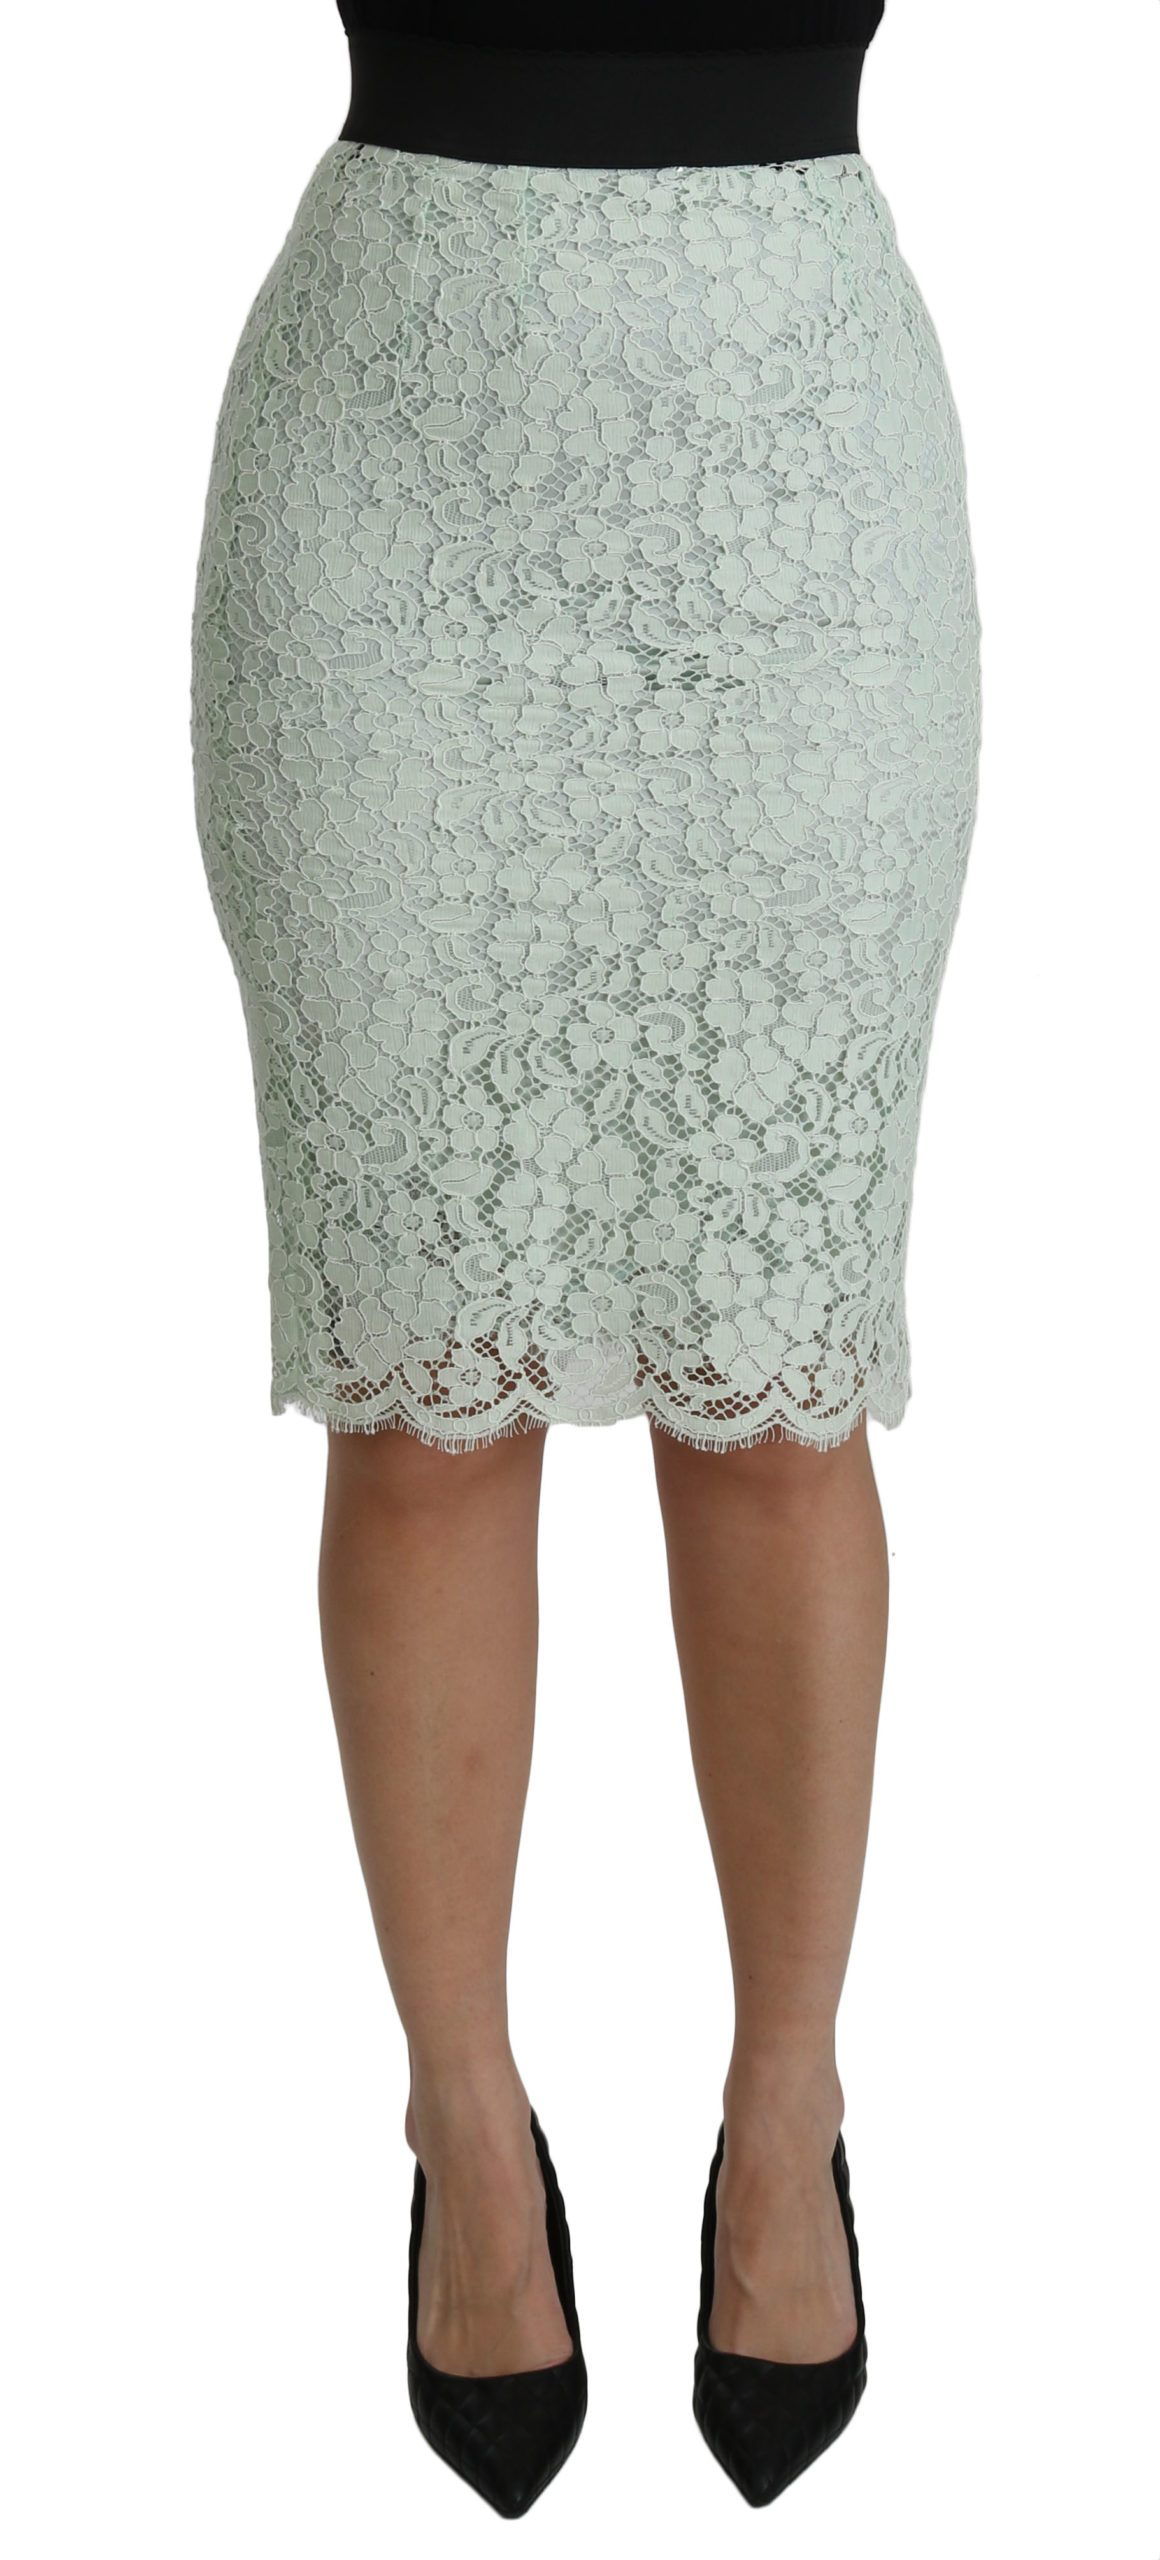 Dolce & Gabbana Women's Lace Pencil High Waist Cotton Mint Skirt Green SKI1380 - IT36   XS